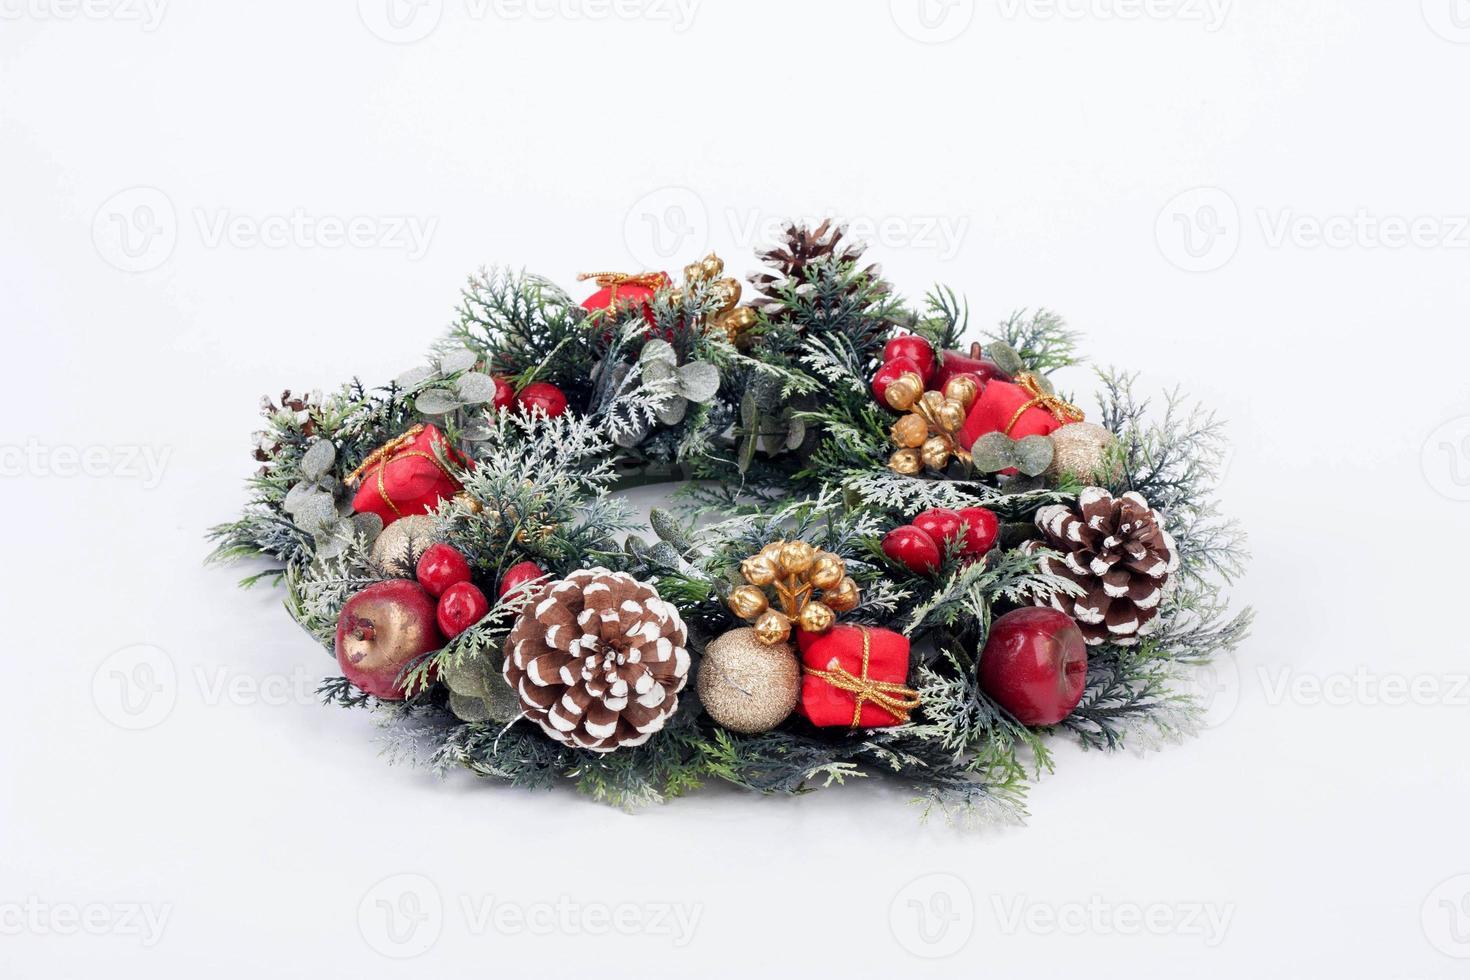 guirlanda de natal tradicional em fundo branco foto